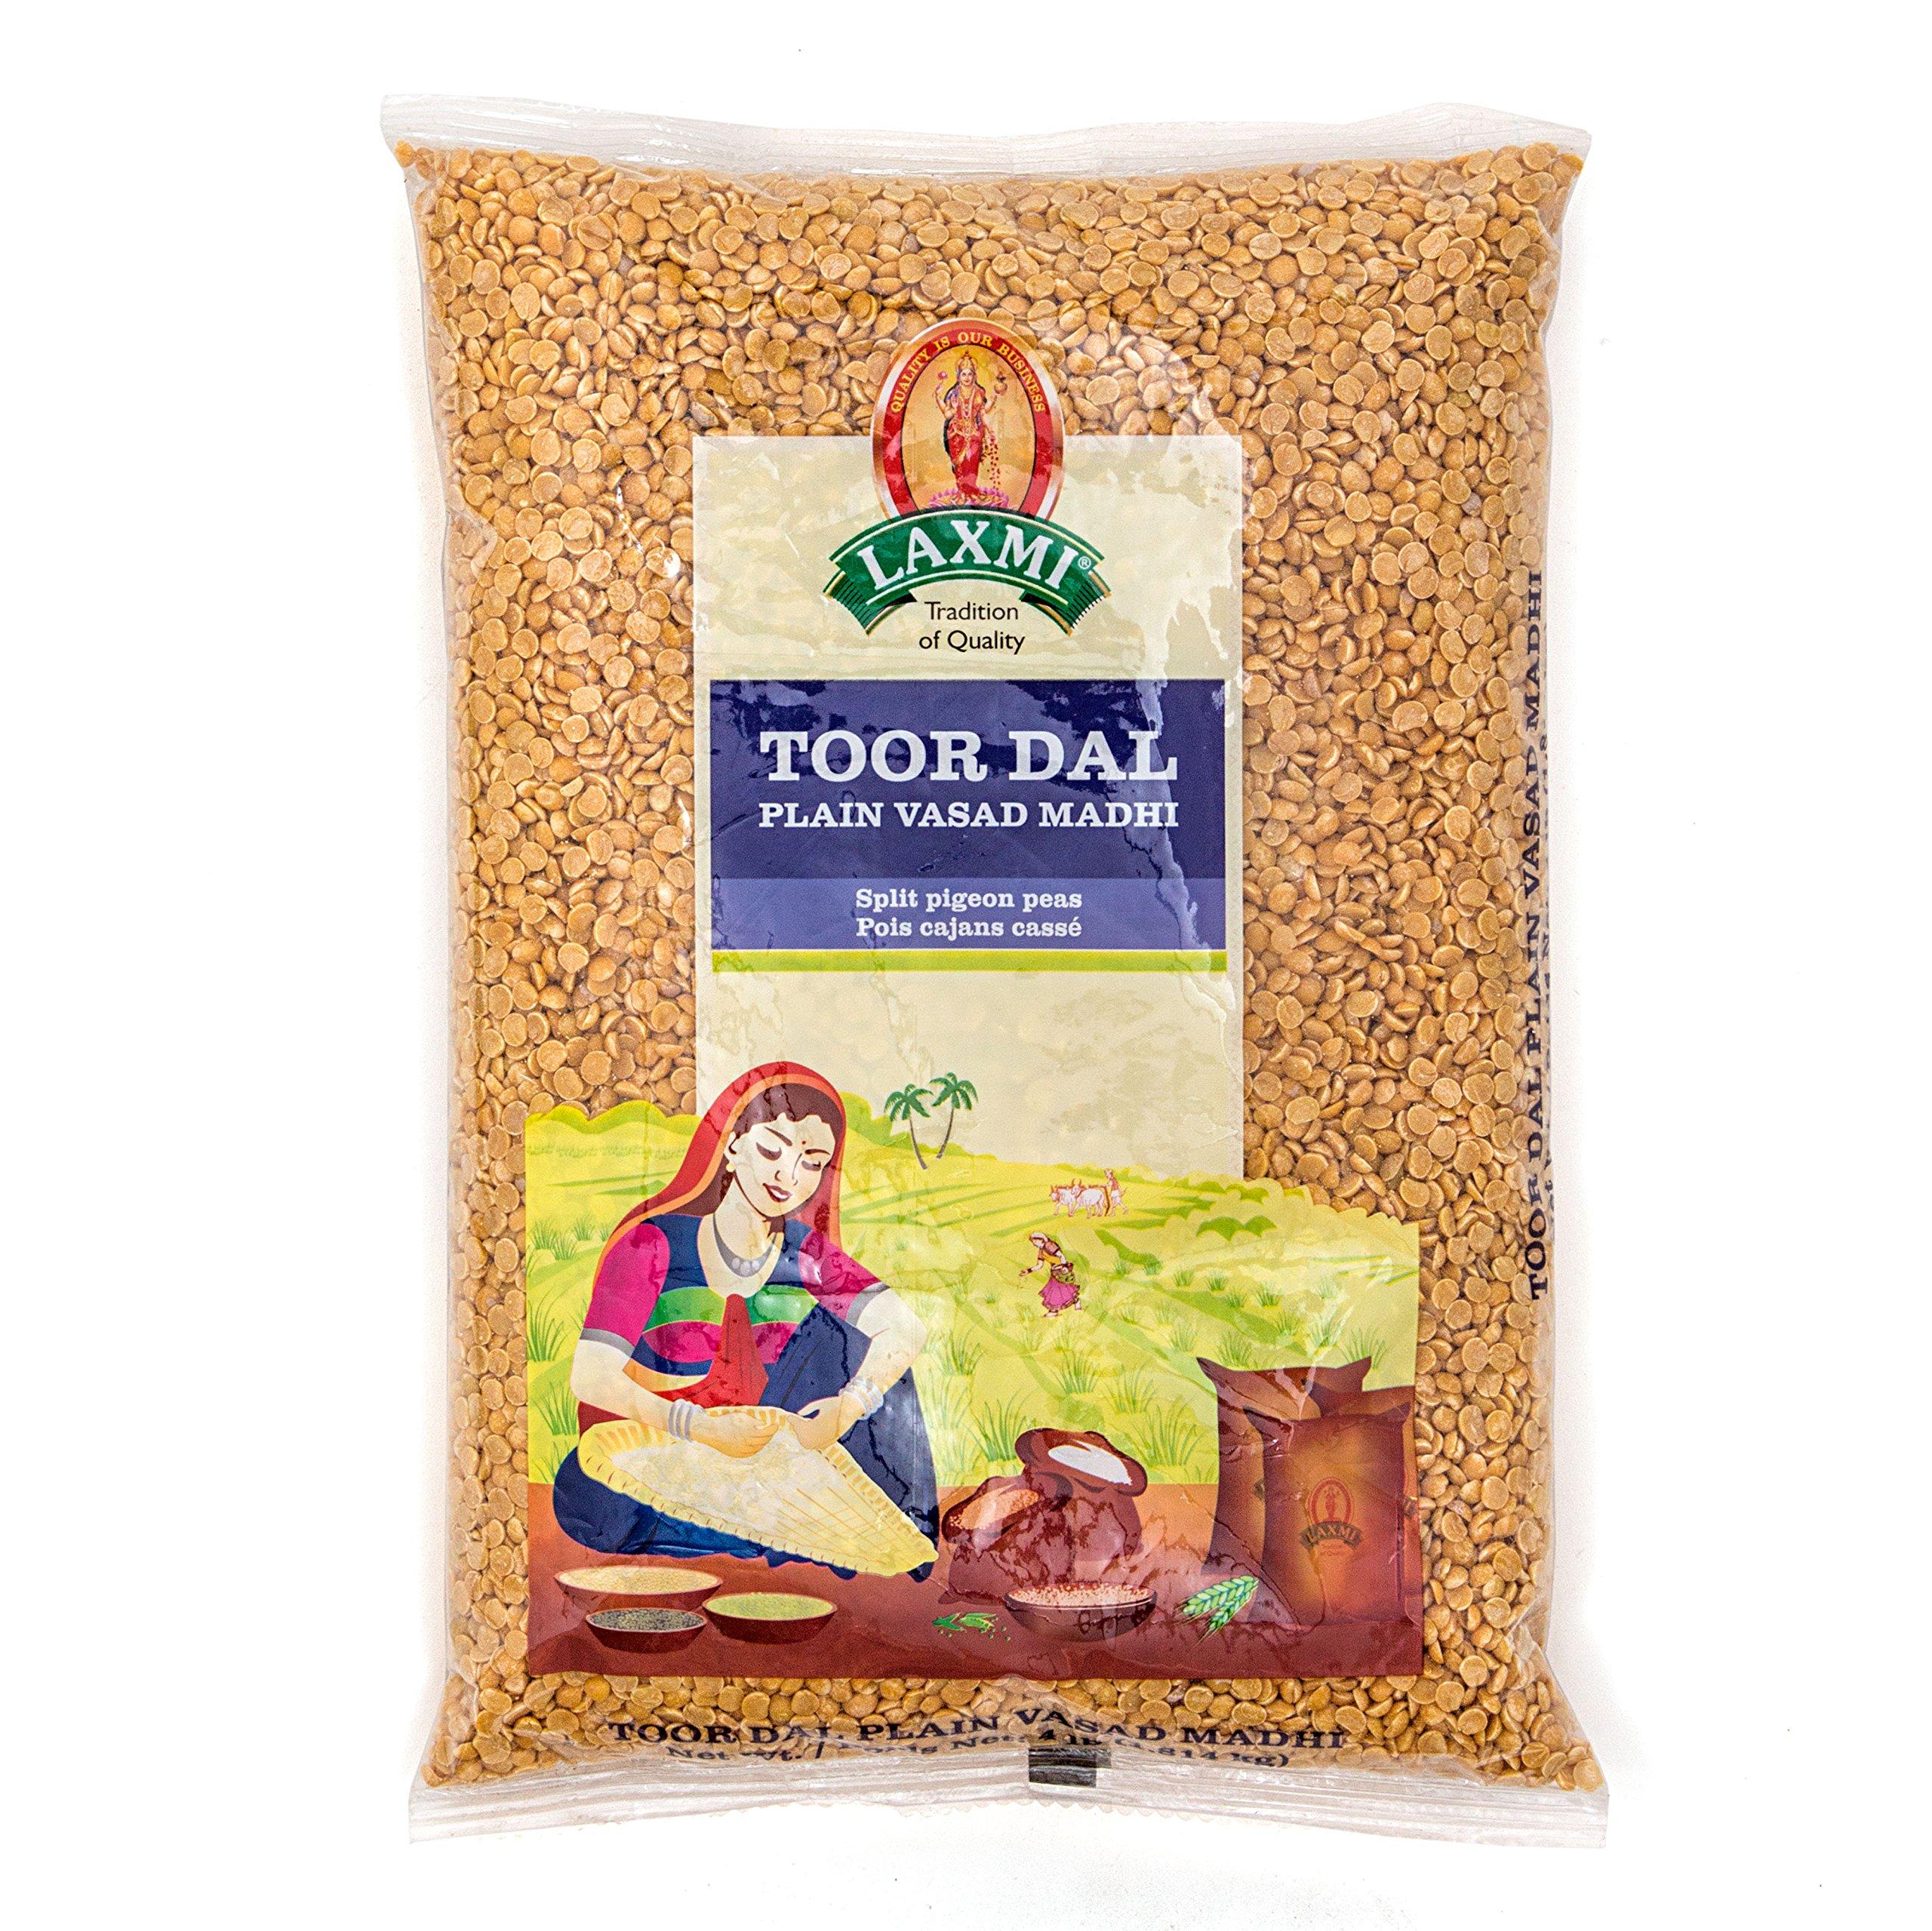 Laxmi Sona Masoori Rice & Laxmi Toor Dal Bundle - (10lb Rice and 4lb Dal) by Laxmi (Image #2)